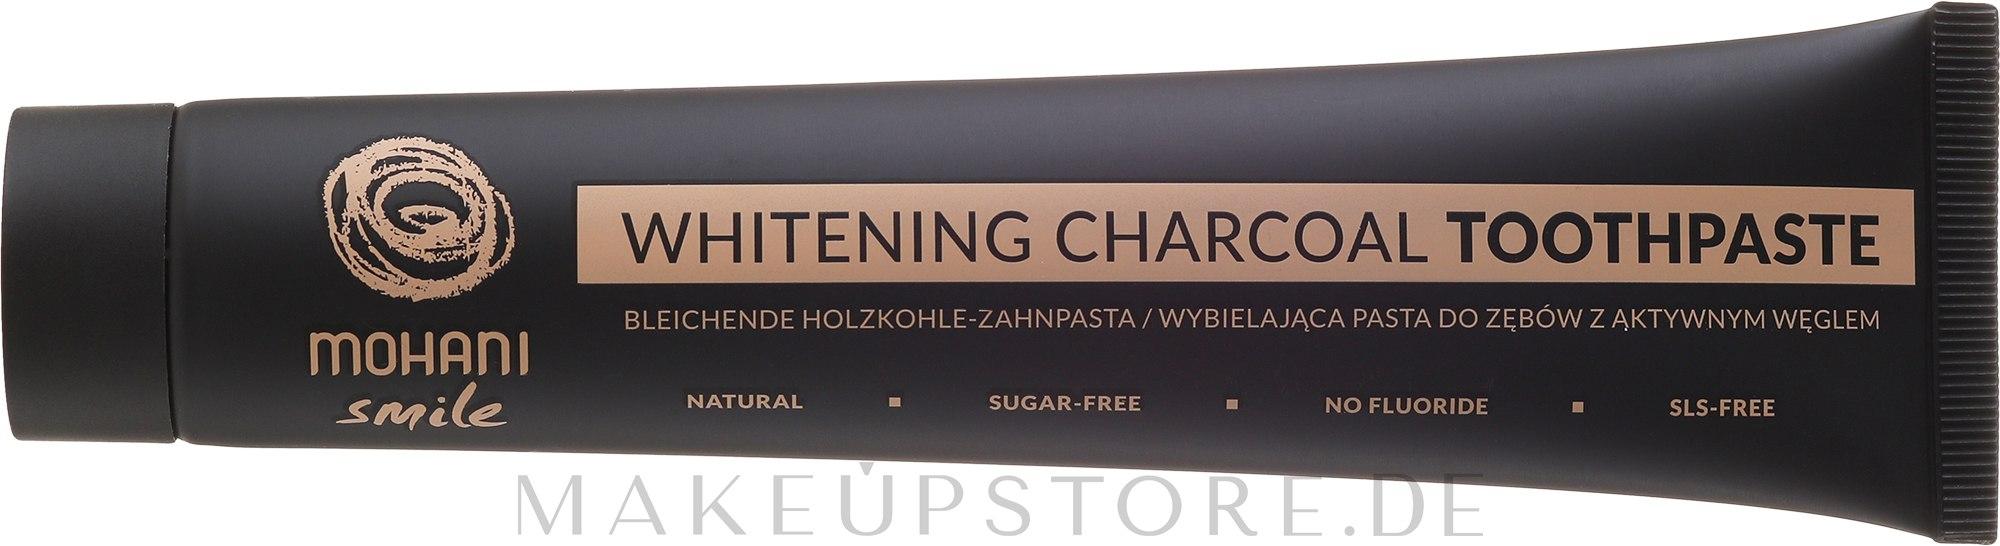 Natürliche bleichende Holzkohle-Zahnpasta - Mohani Smile Whitening Charcoal Toothpaste — Bild 75 ml